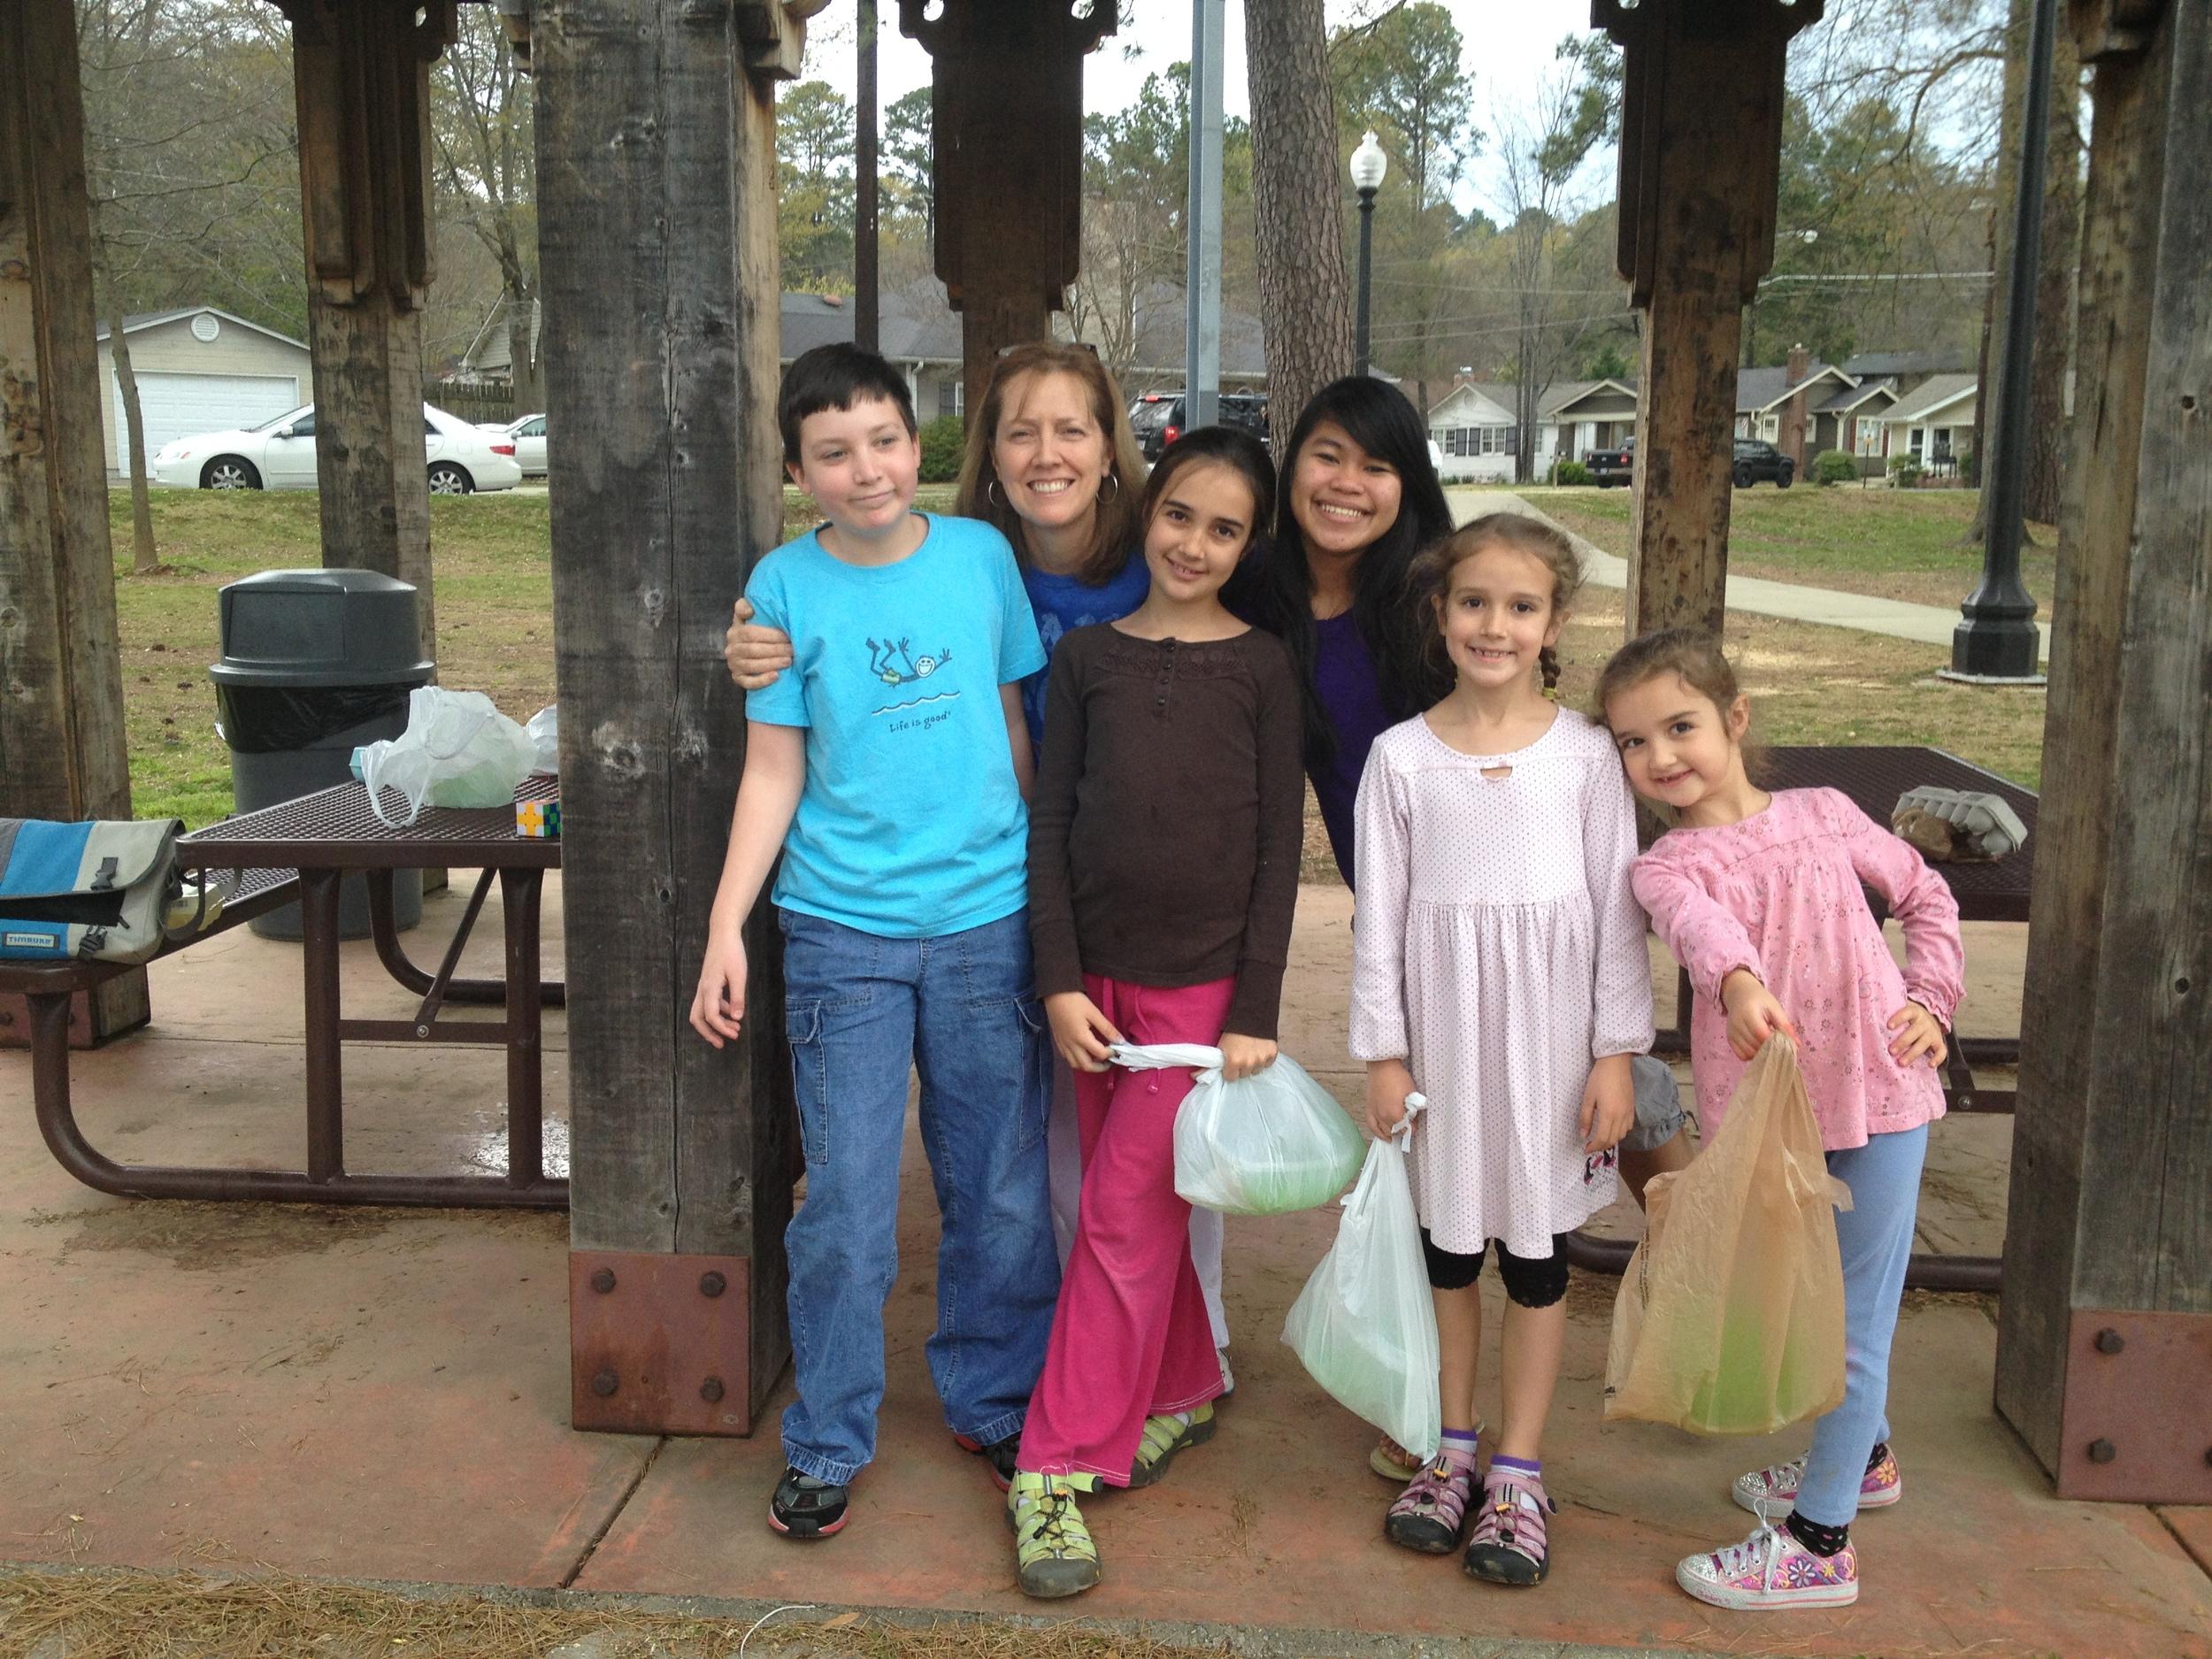 Easter egg hunt with Julie and Jonathan Ennis